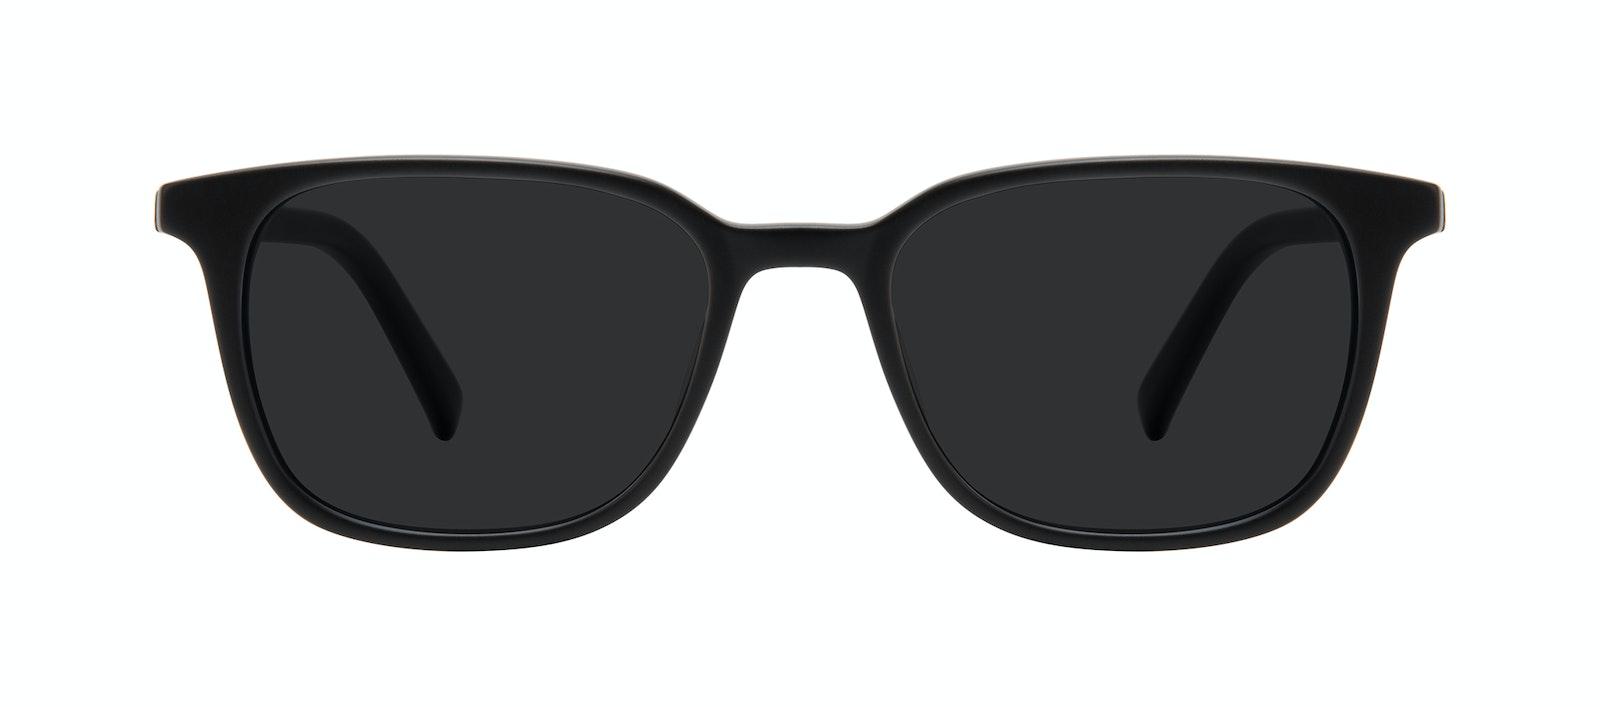 Affordable Fashion Glasses Square Sunglasses Men Choice Black Matte Front